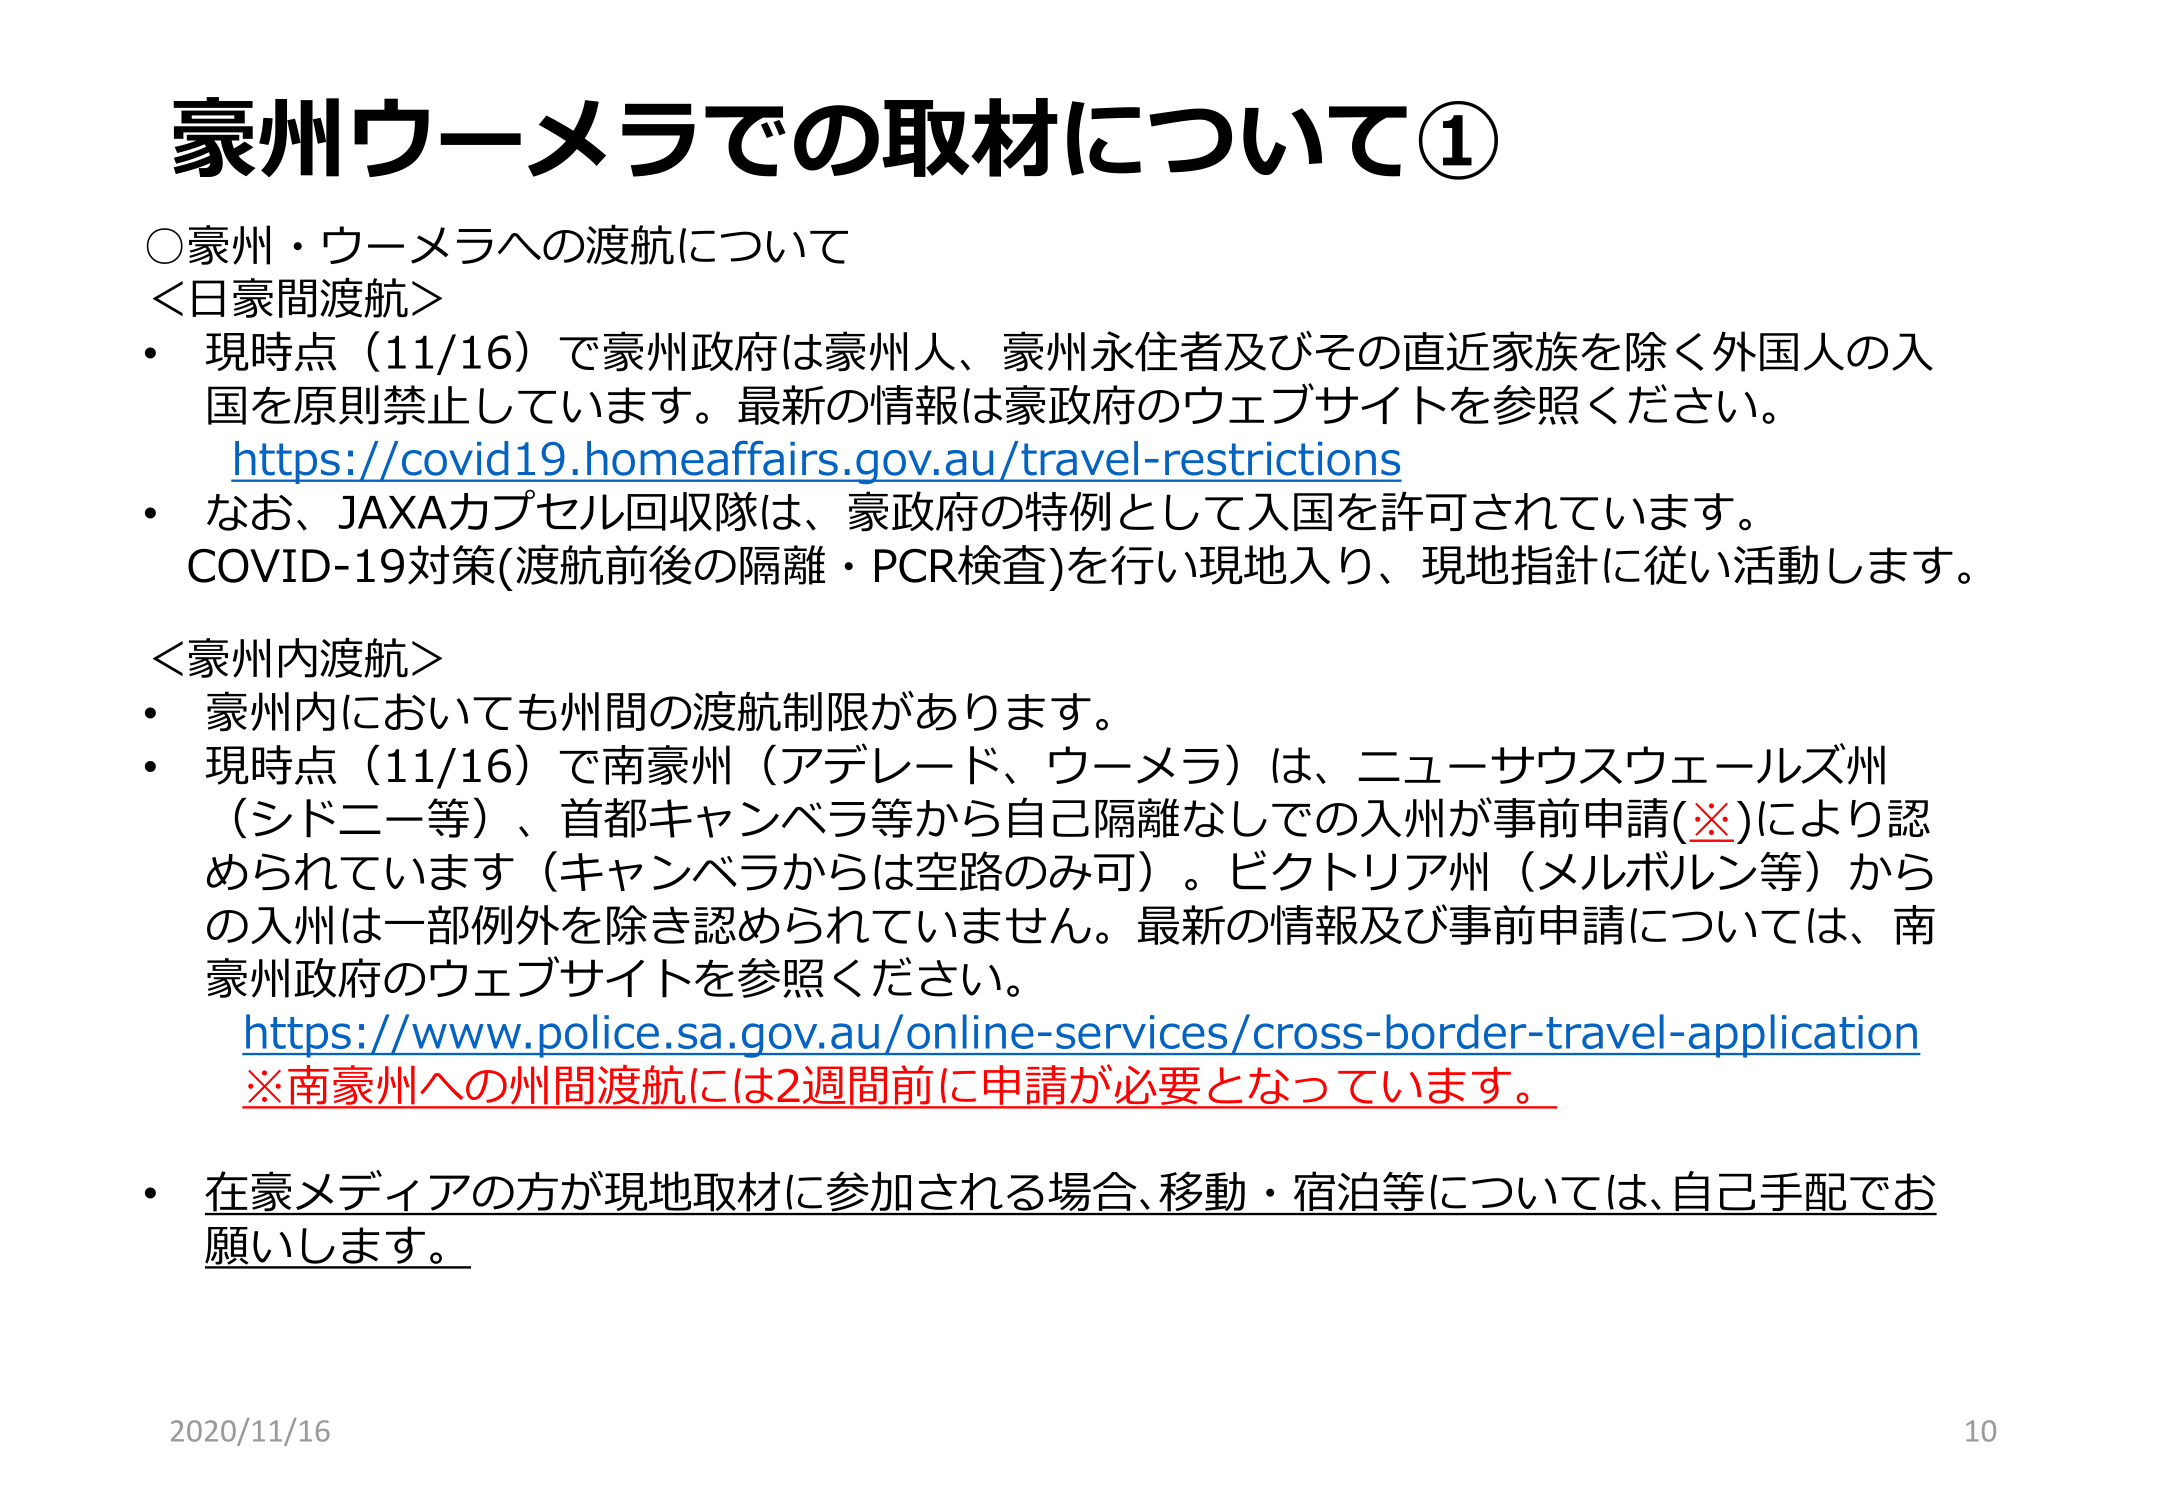 f:id:Imamura:20201117222258p:plain